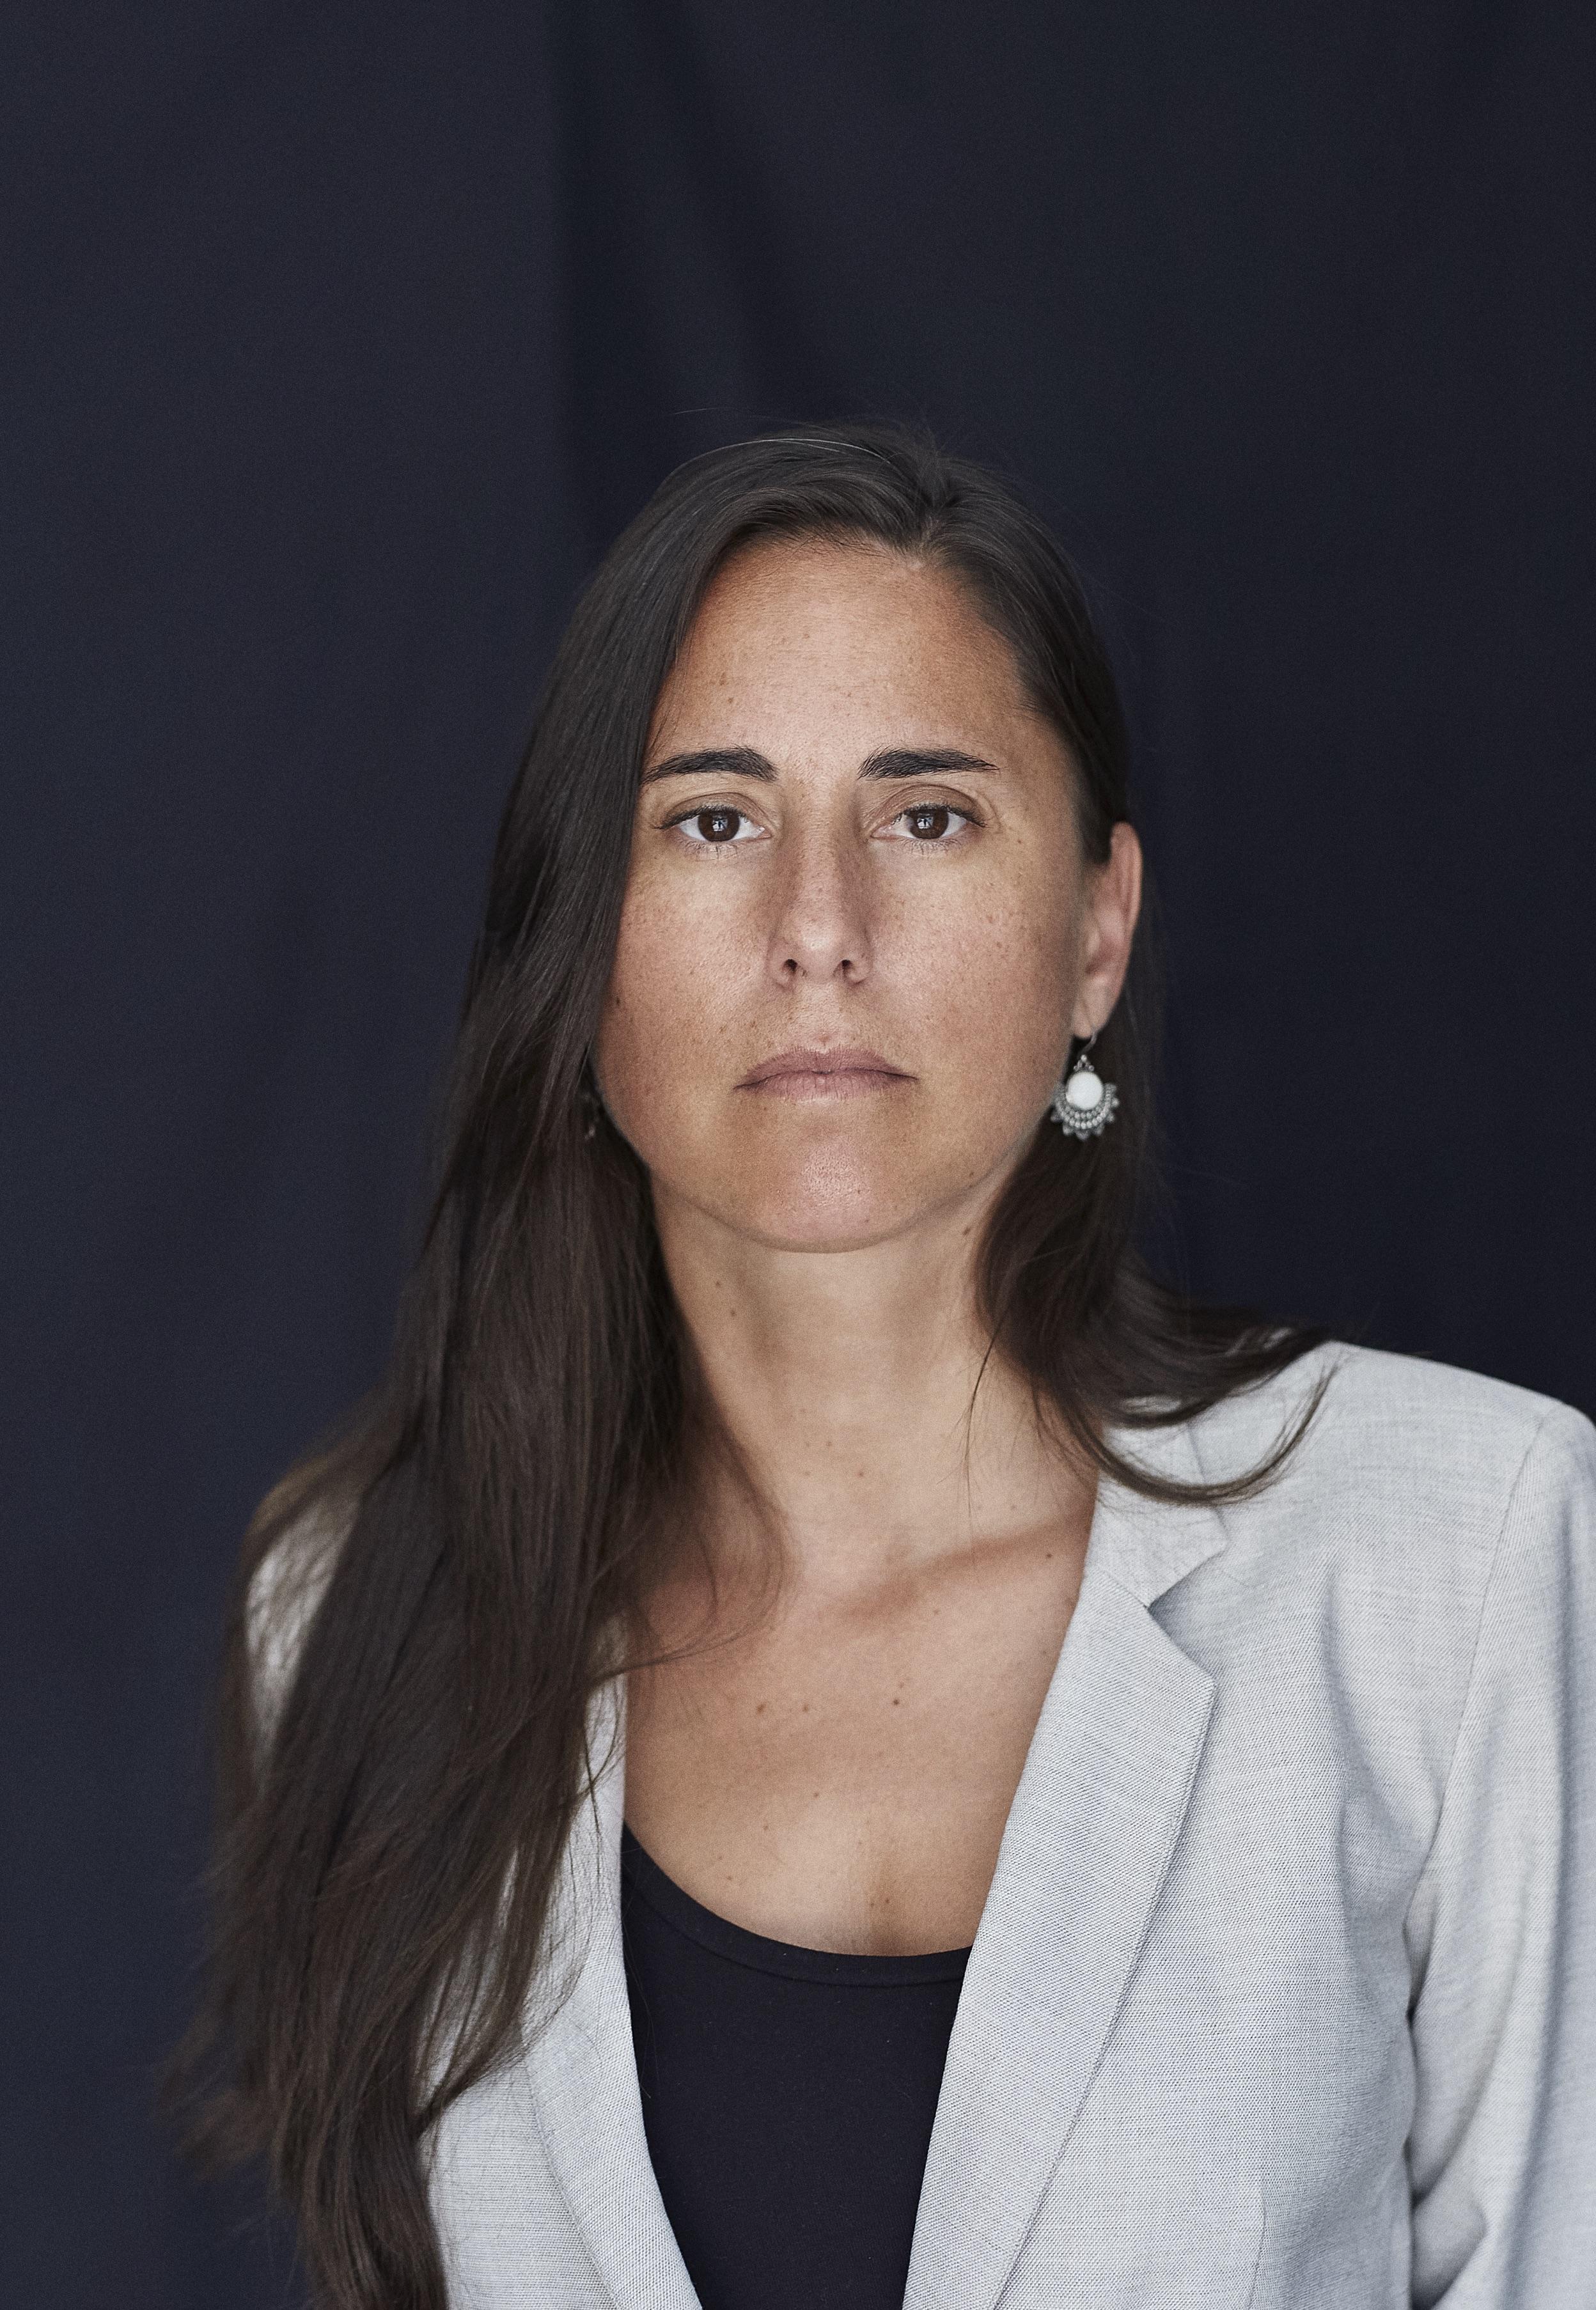 Soledad Antelada Toledano